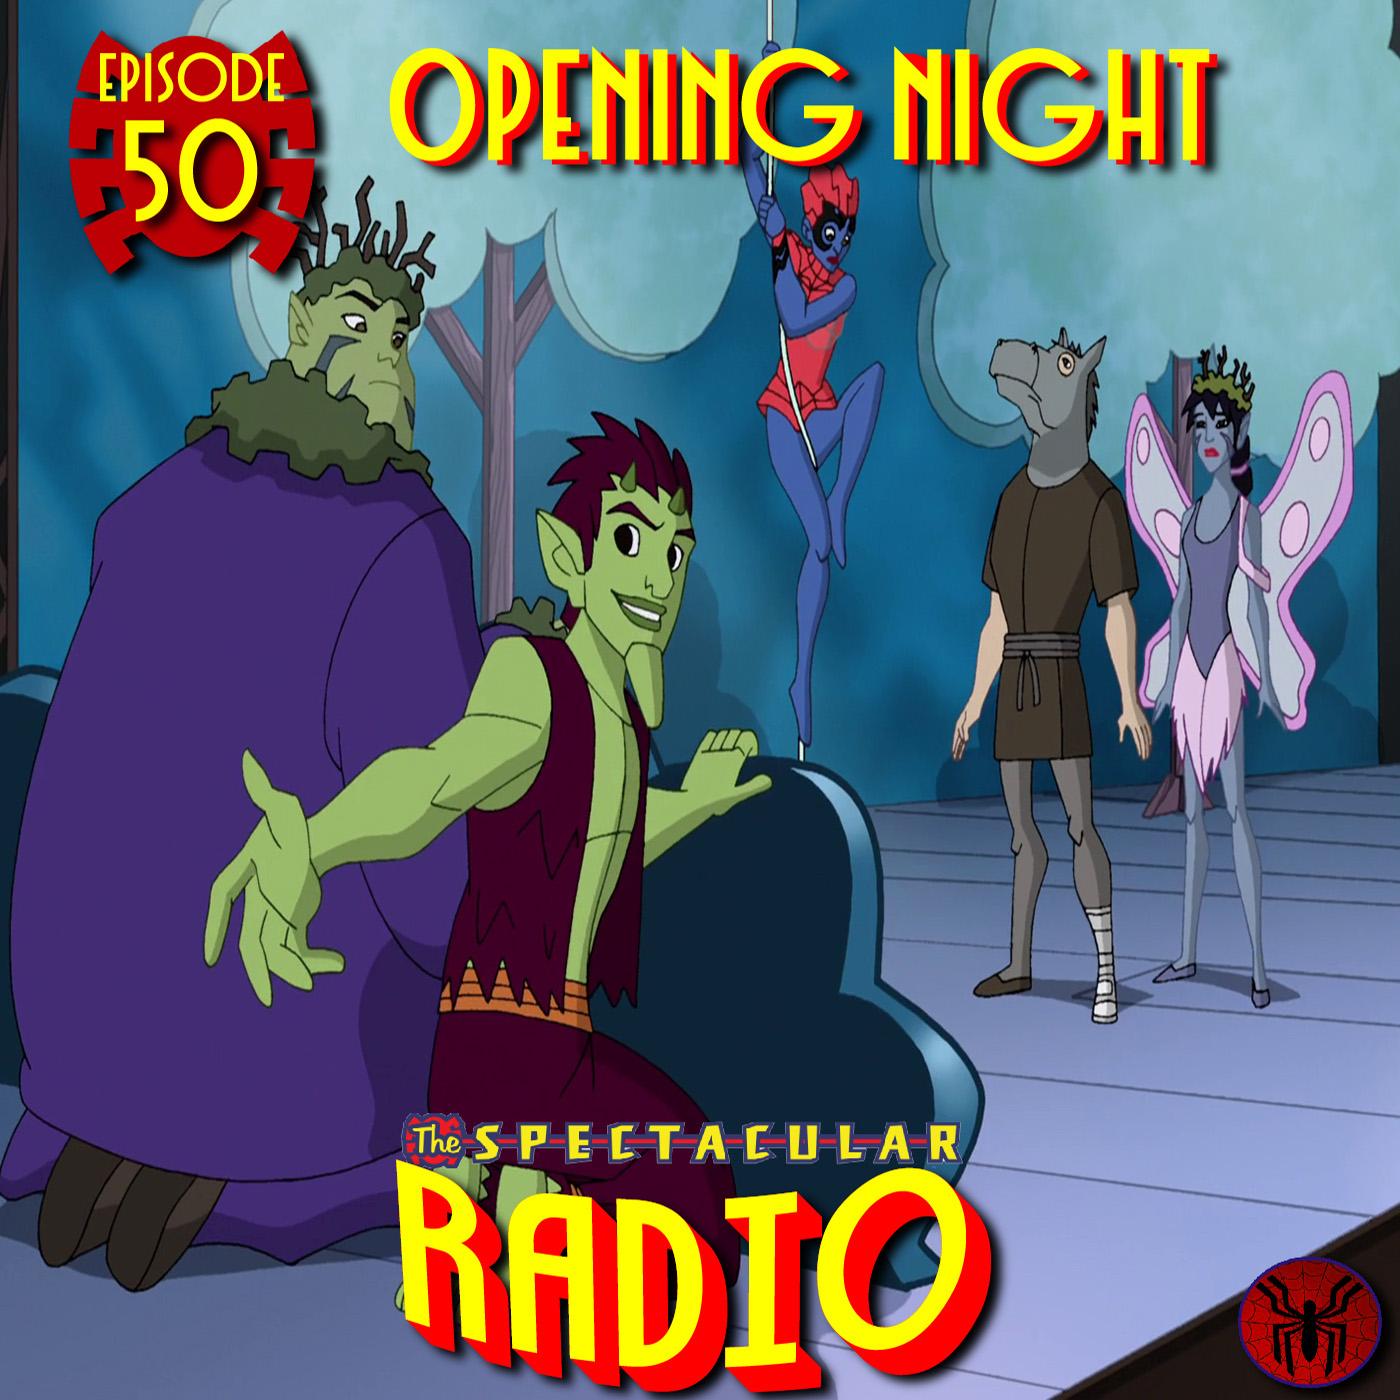 "Spectacular Radio Episode 50: ""Opening Night"" Fan-Panel"